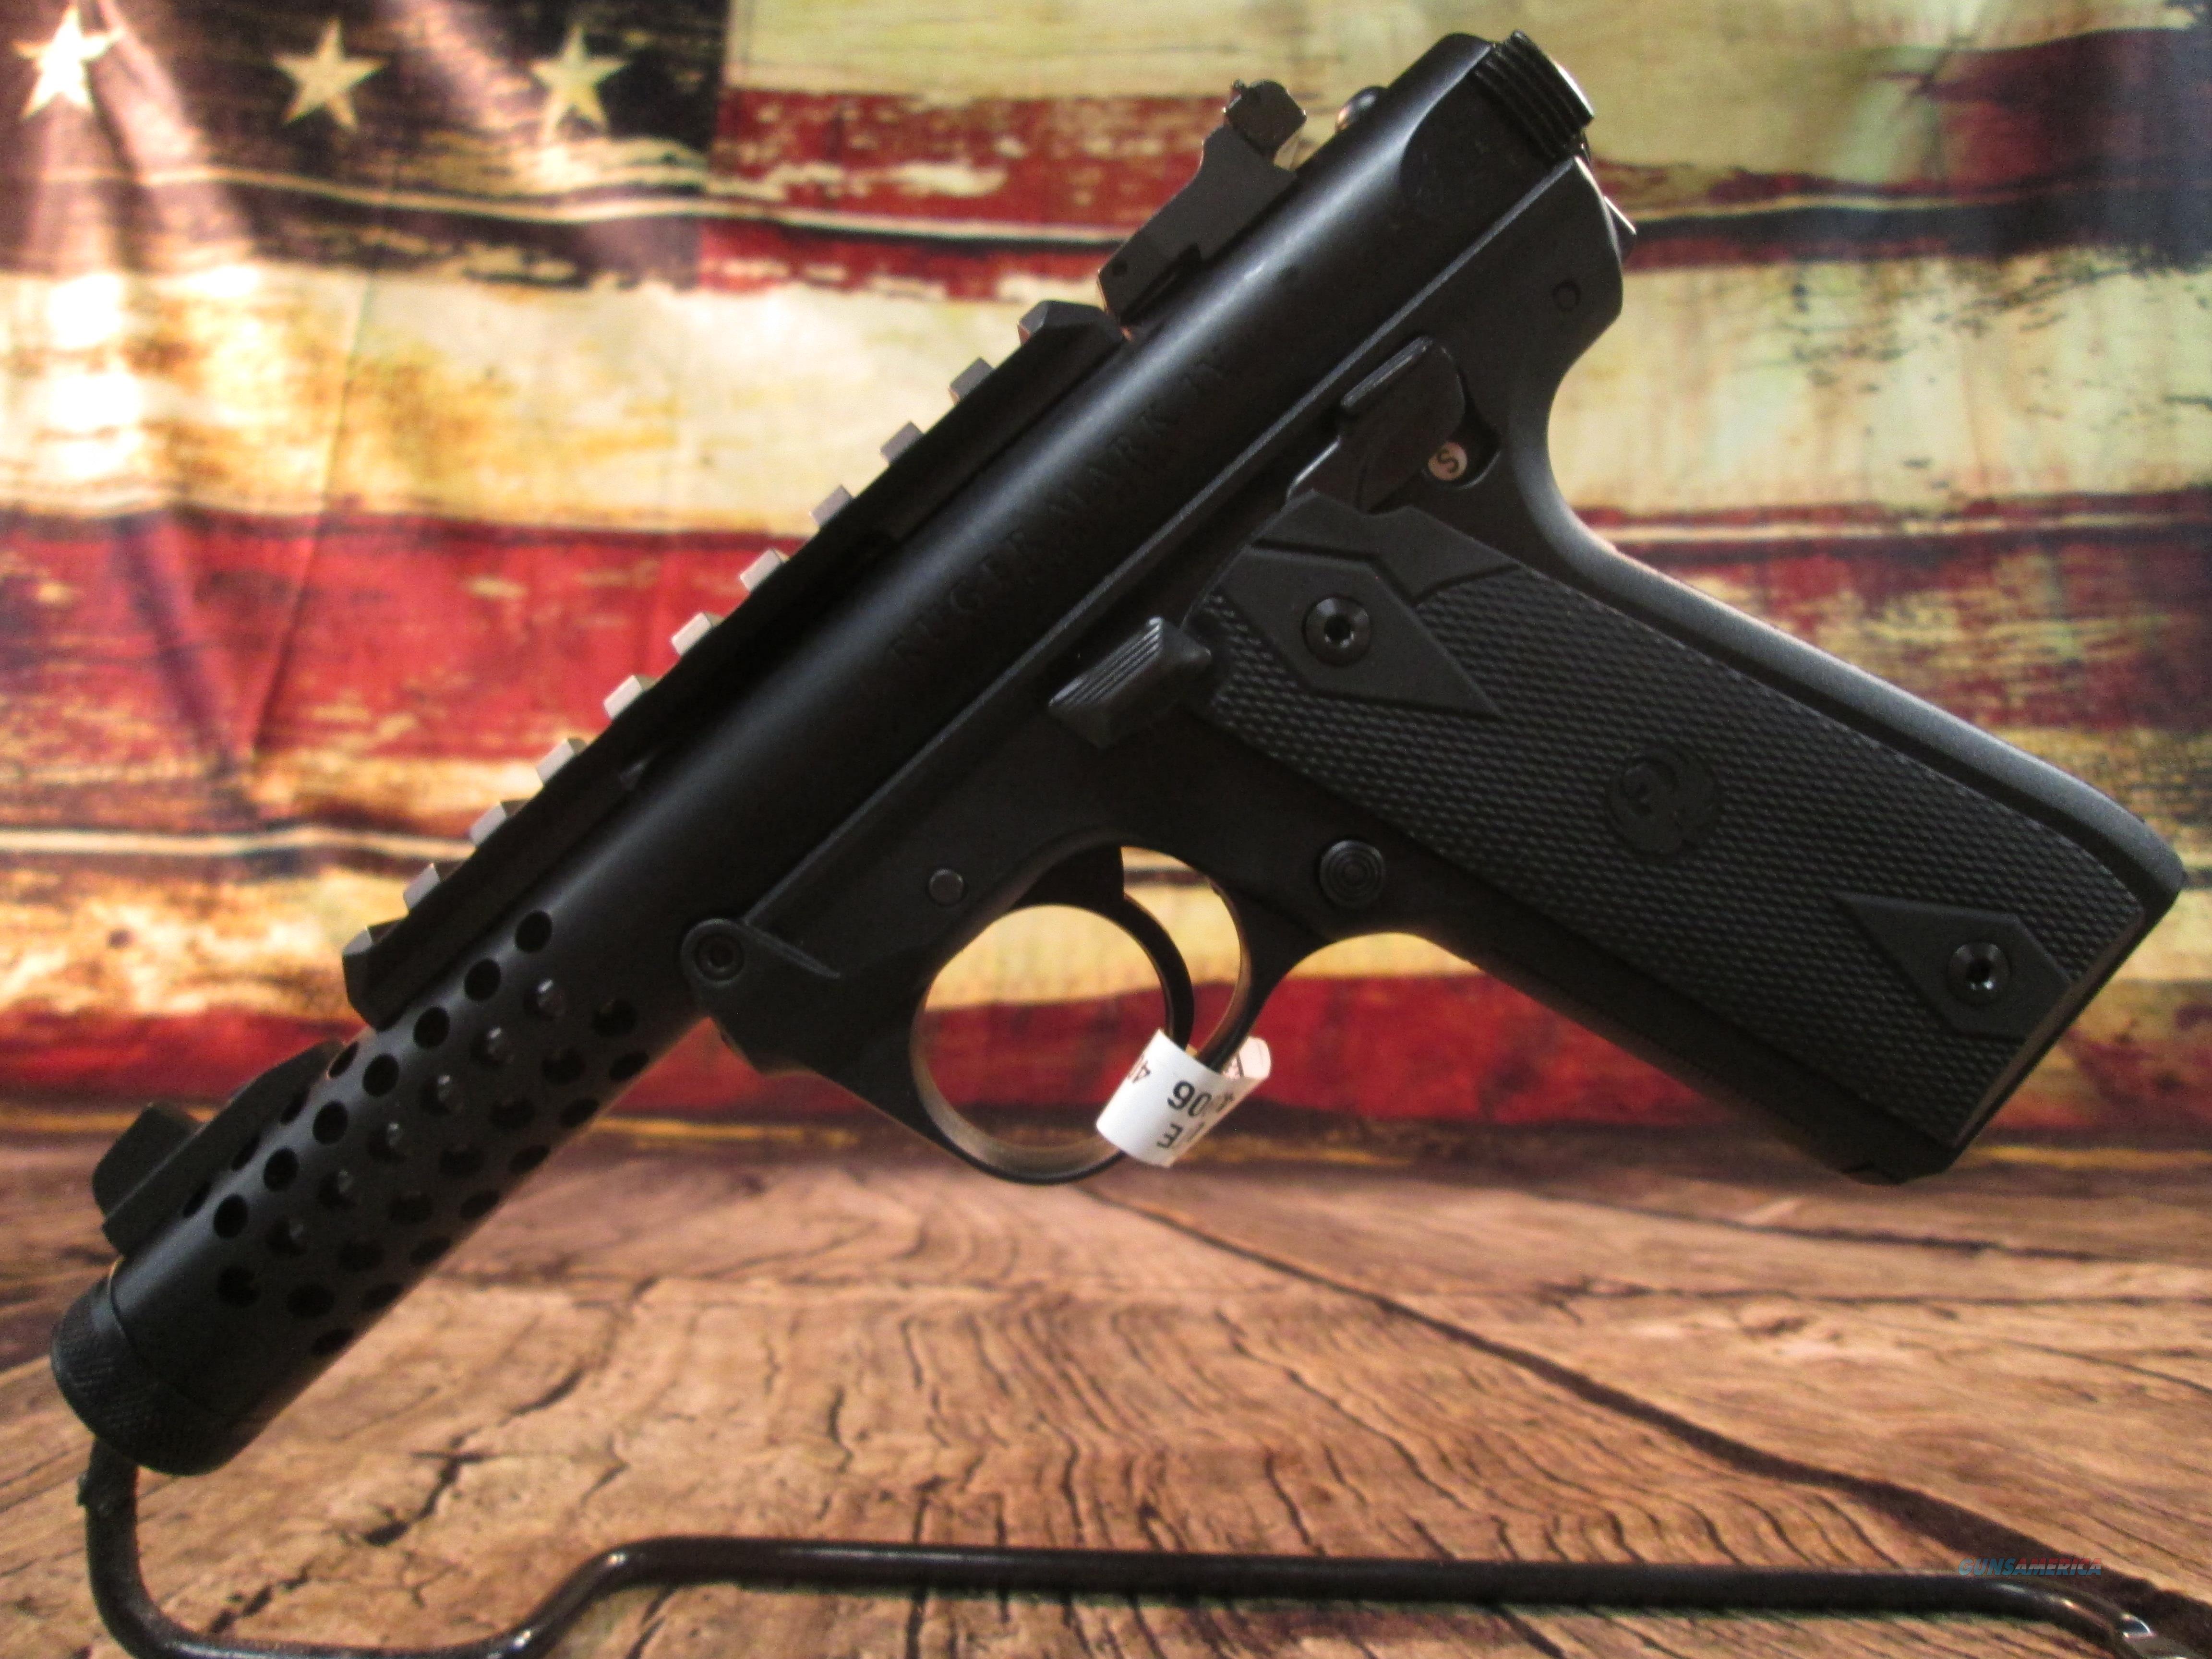 RUGER 22/45 LITE MKIV THREADED BLACK ANODIZED .22 LR  (43906)   Guns > Pistols > Ruger Semi-Auto Pistols > 22/45